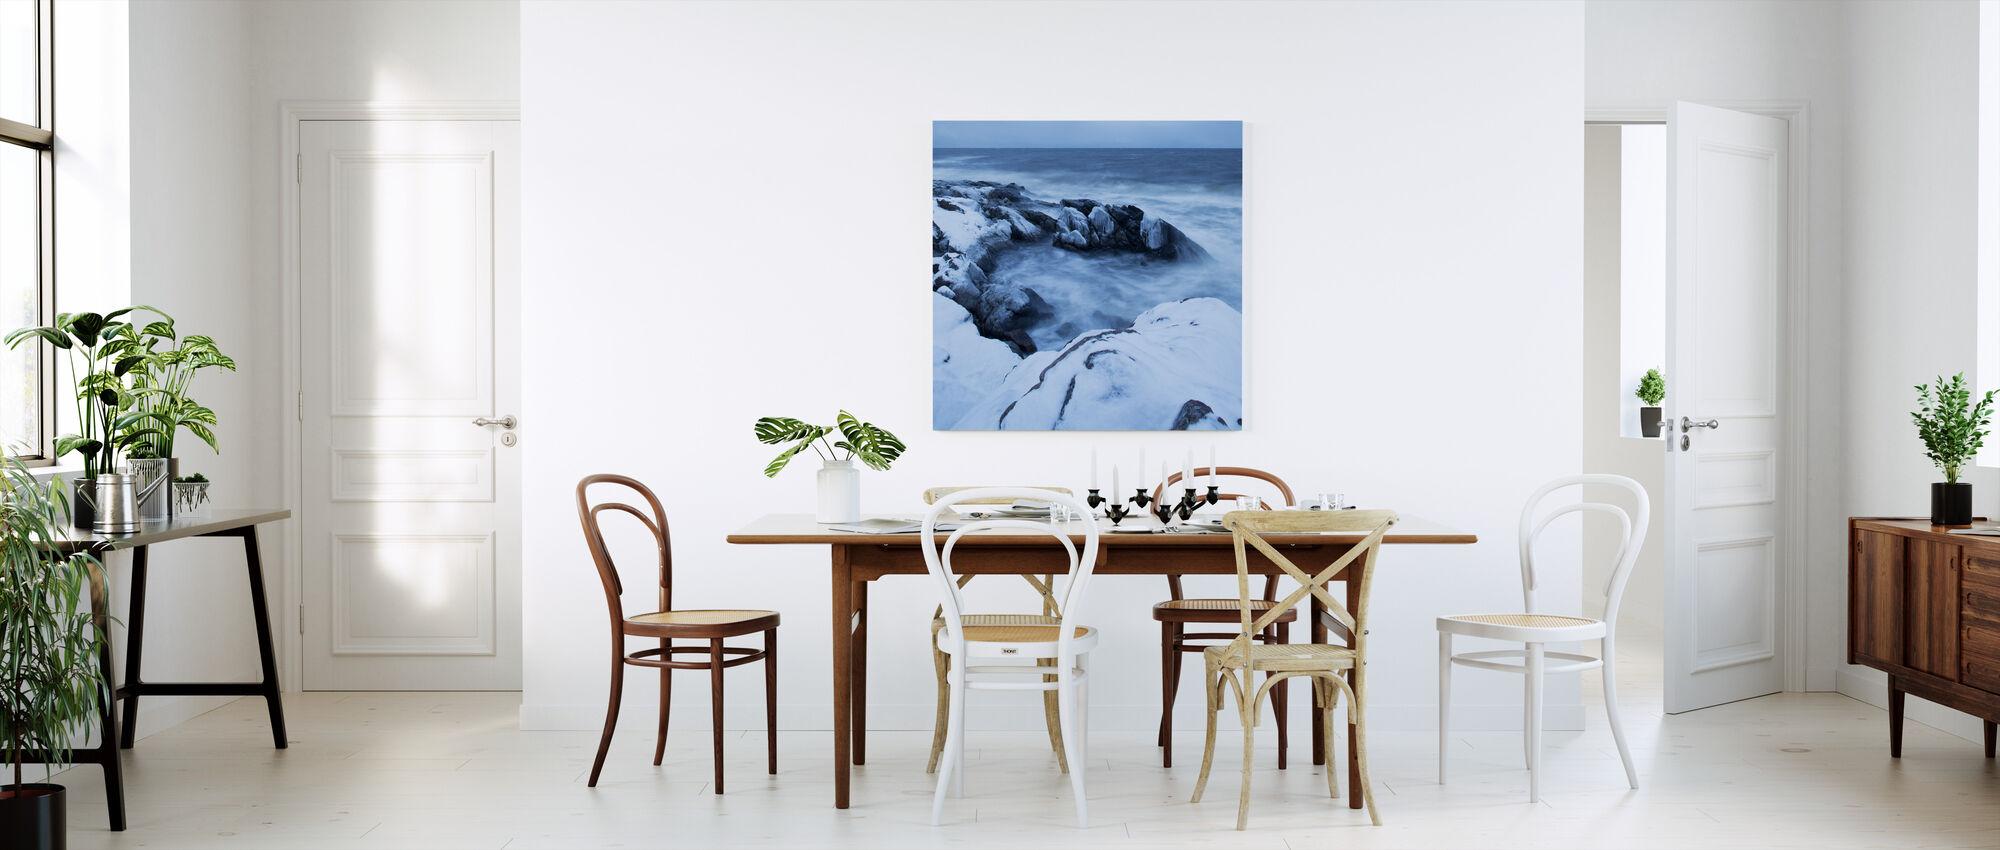 Stenshuvud in Winter Dress - Canvastavla - Kök